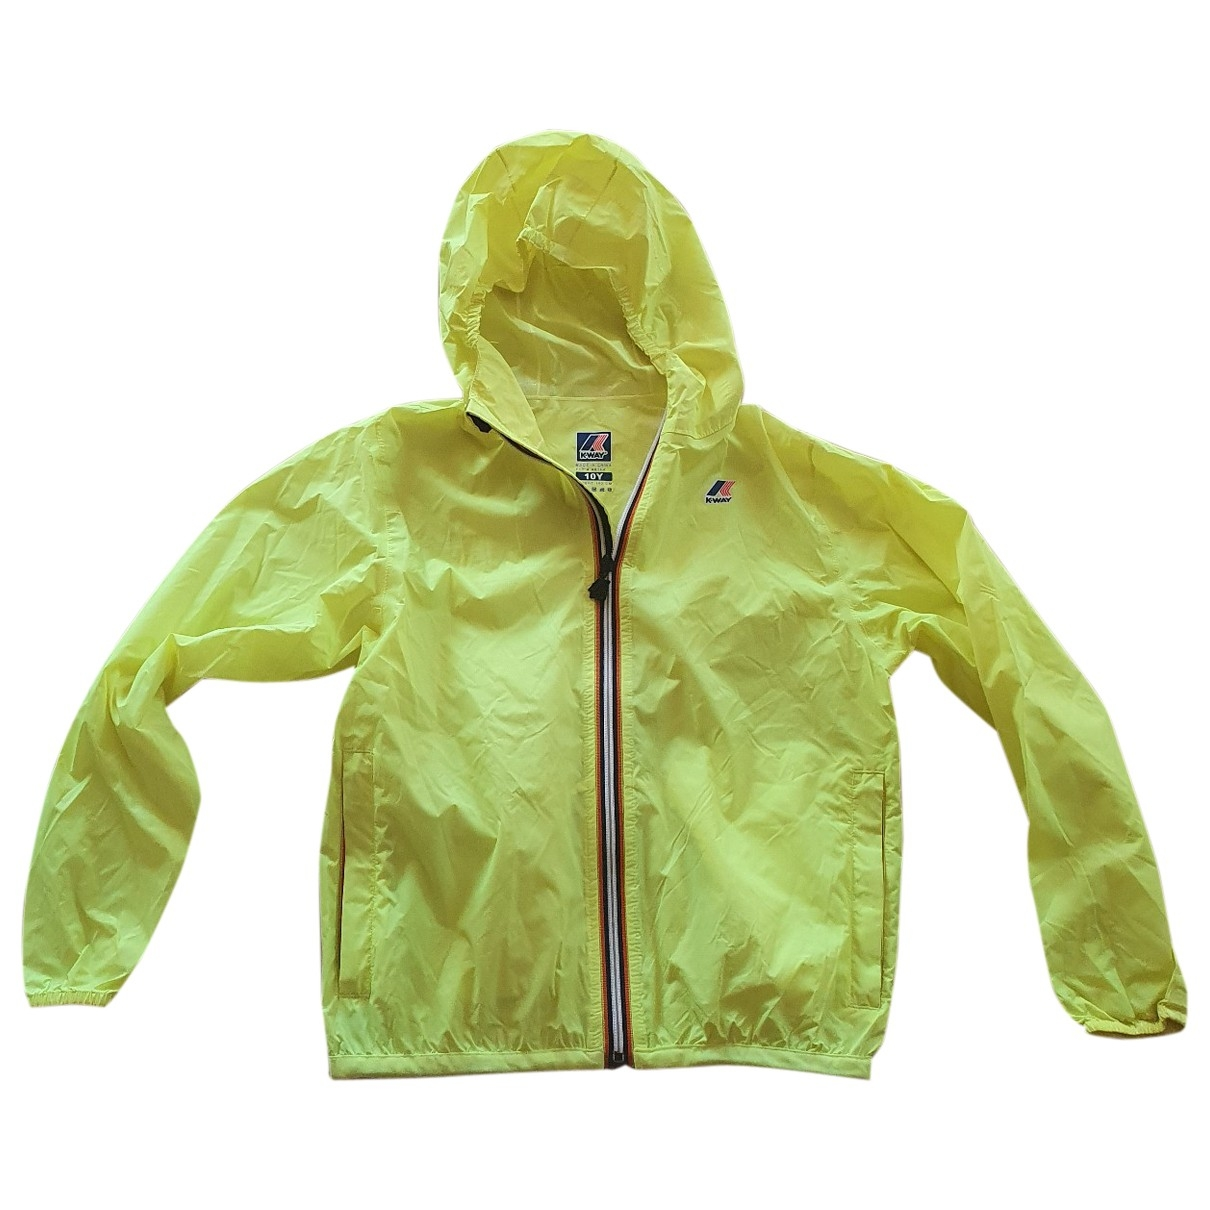 K-way \N Jacke, Maentel in  Gelb Polyester